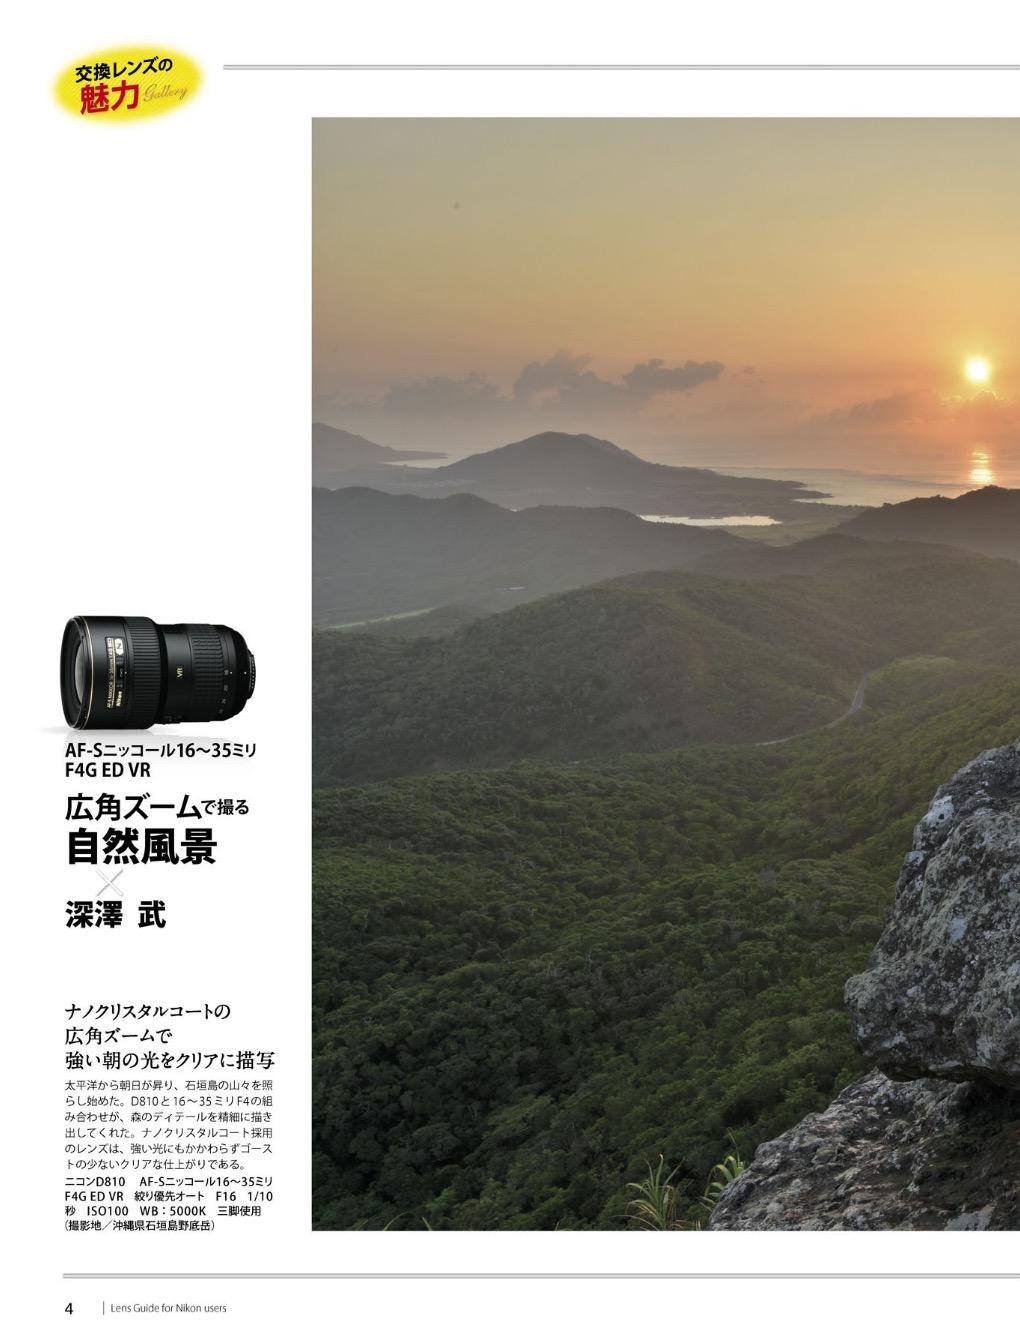 nikon-lens-guide-02